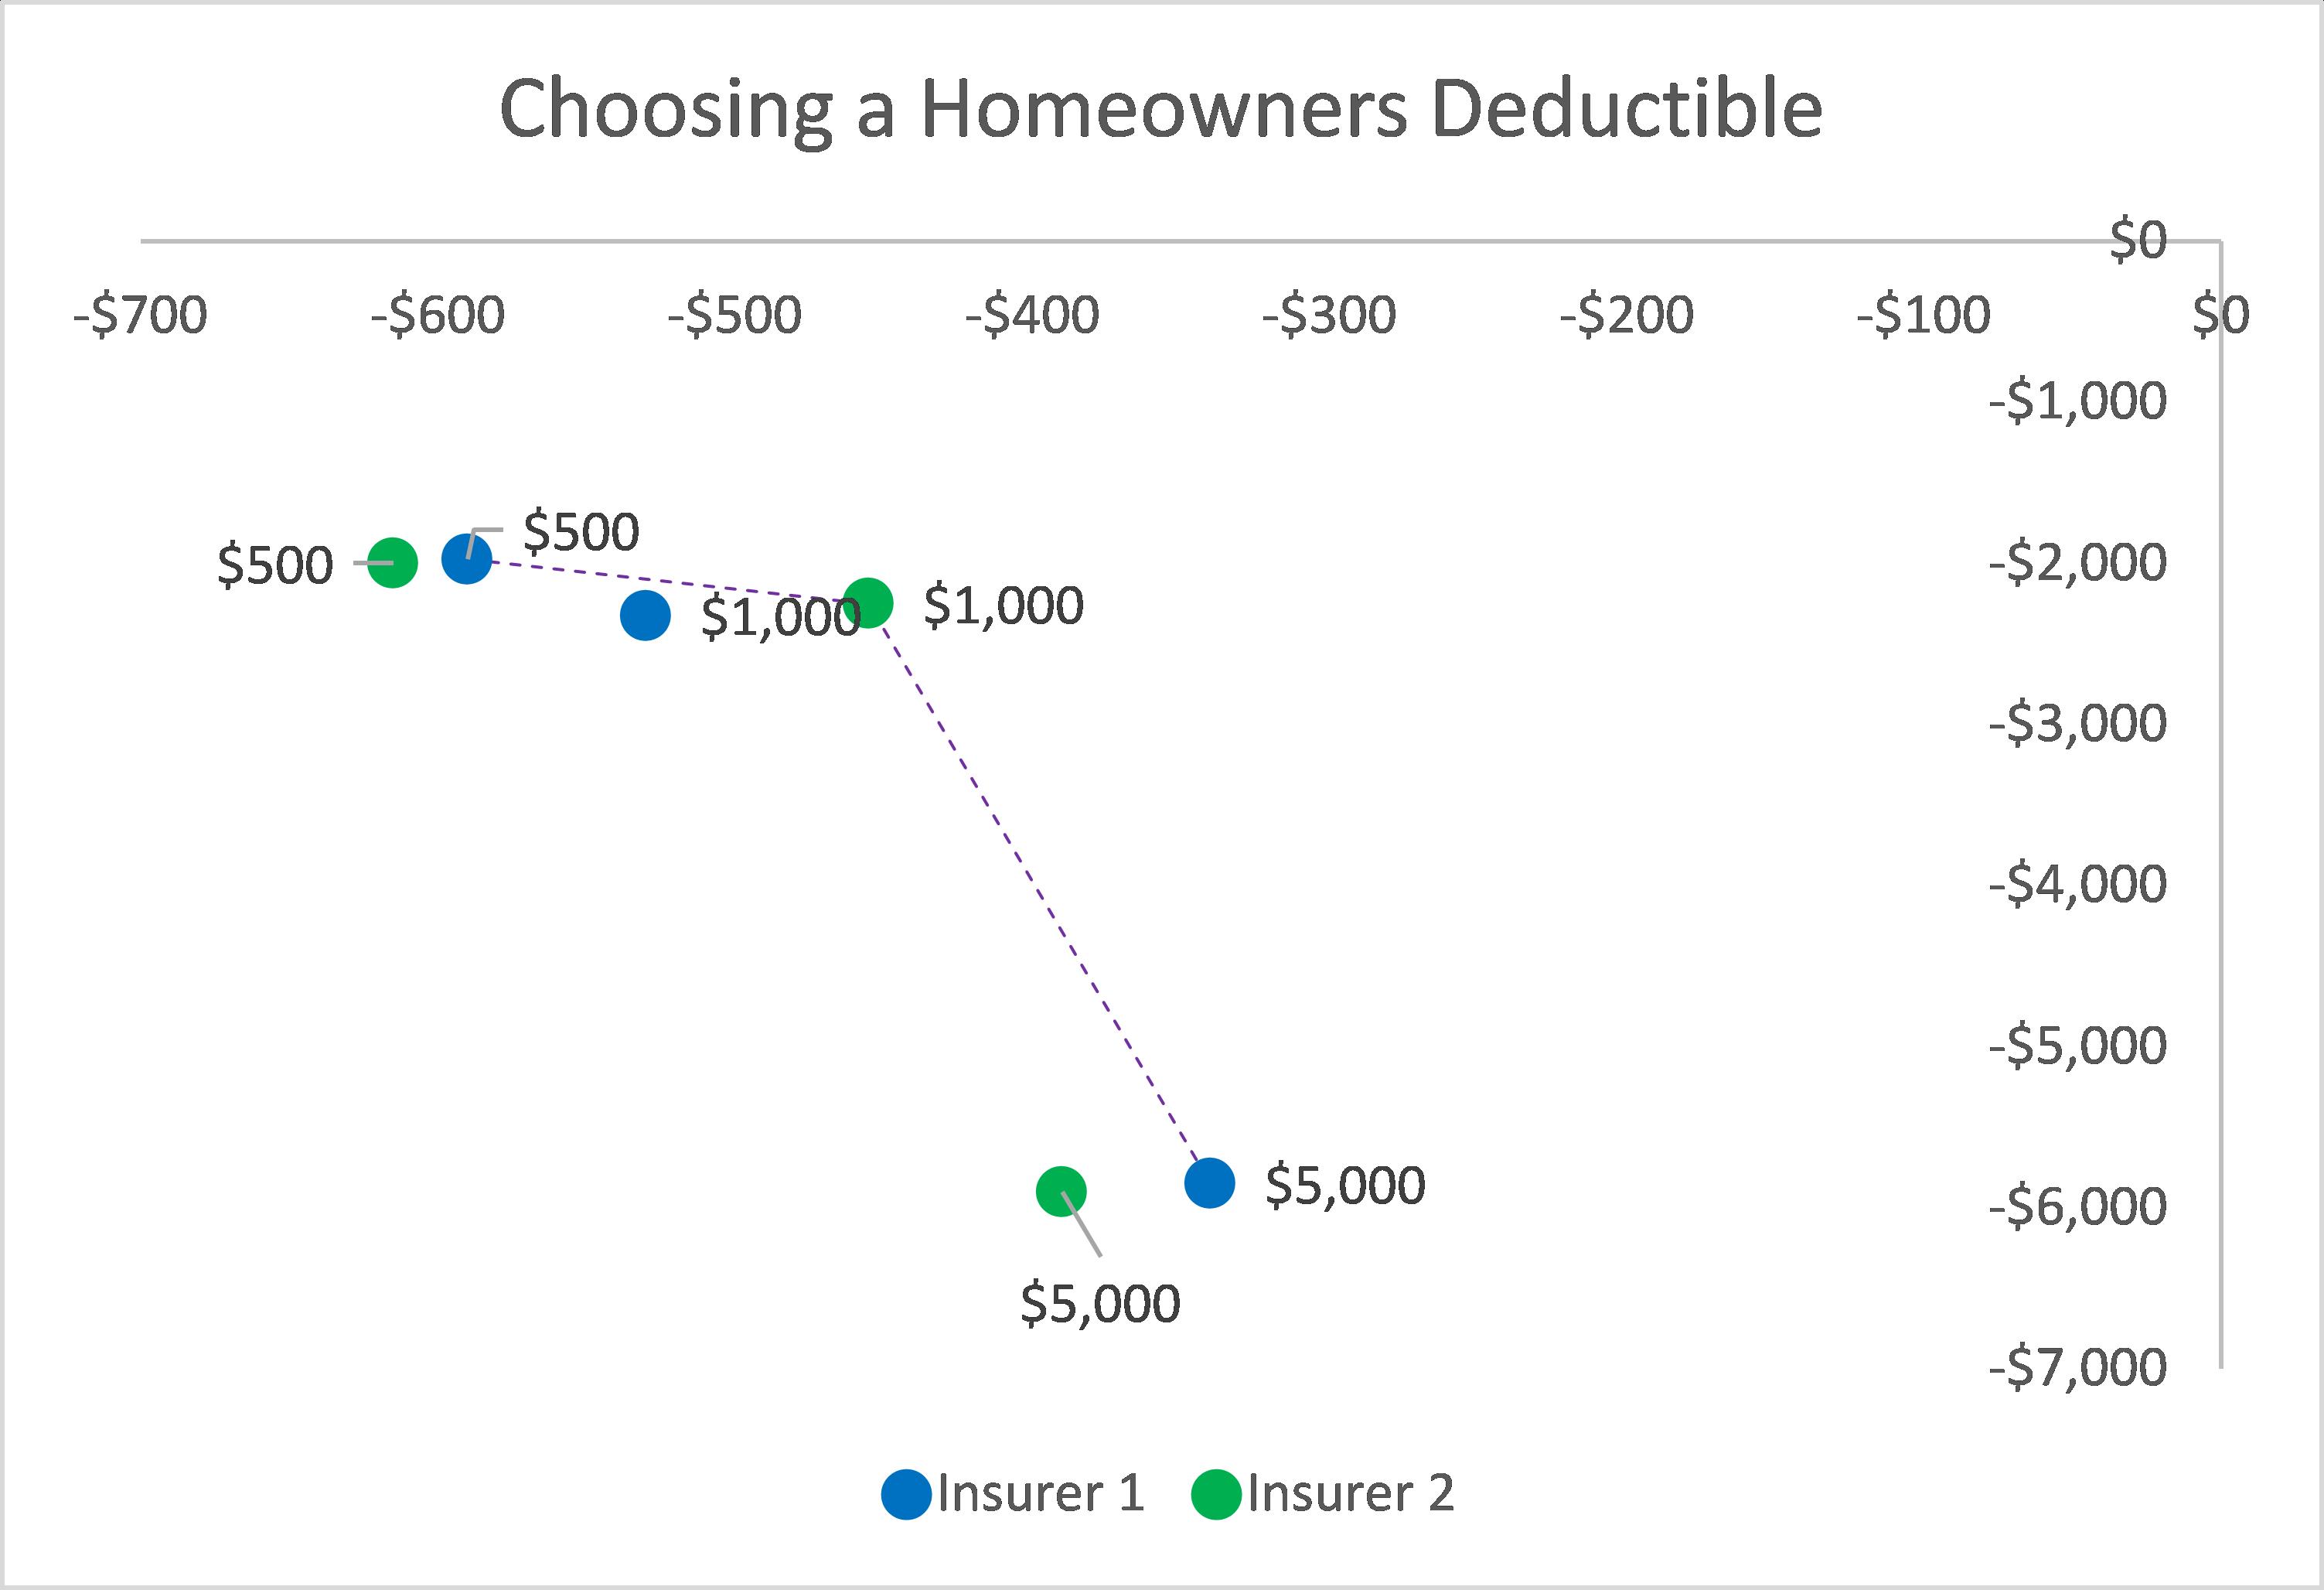 Choosing a Homeowners Deductible